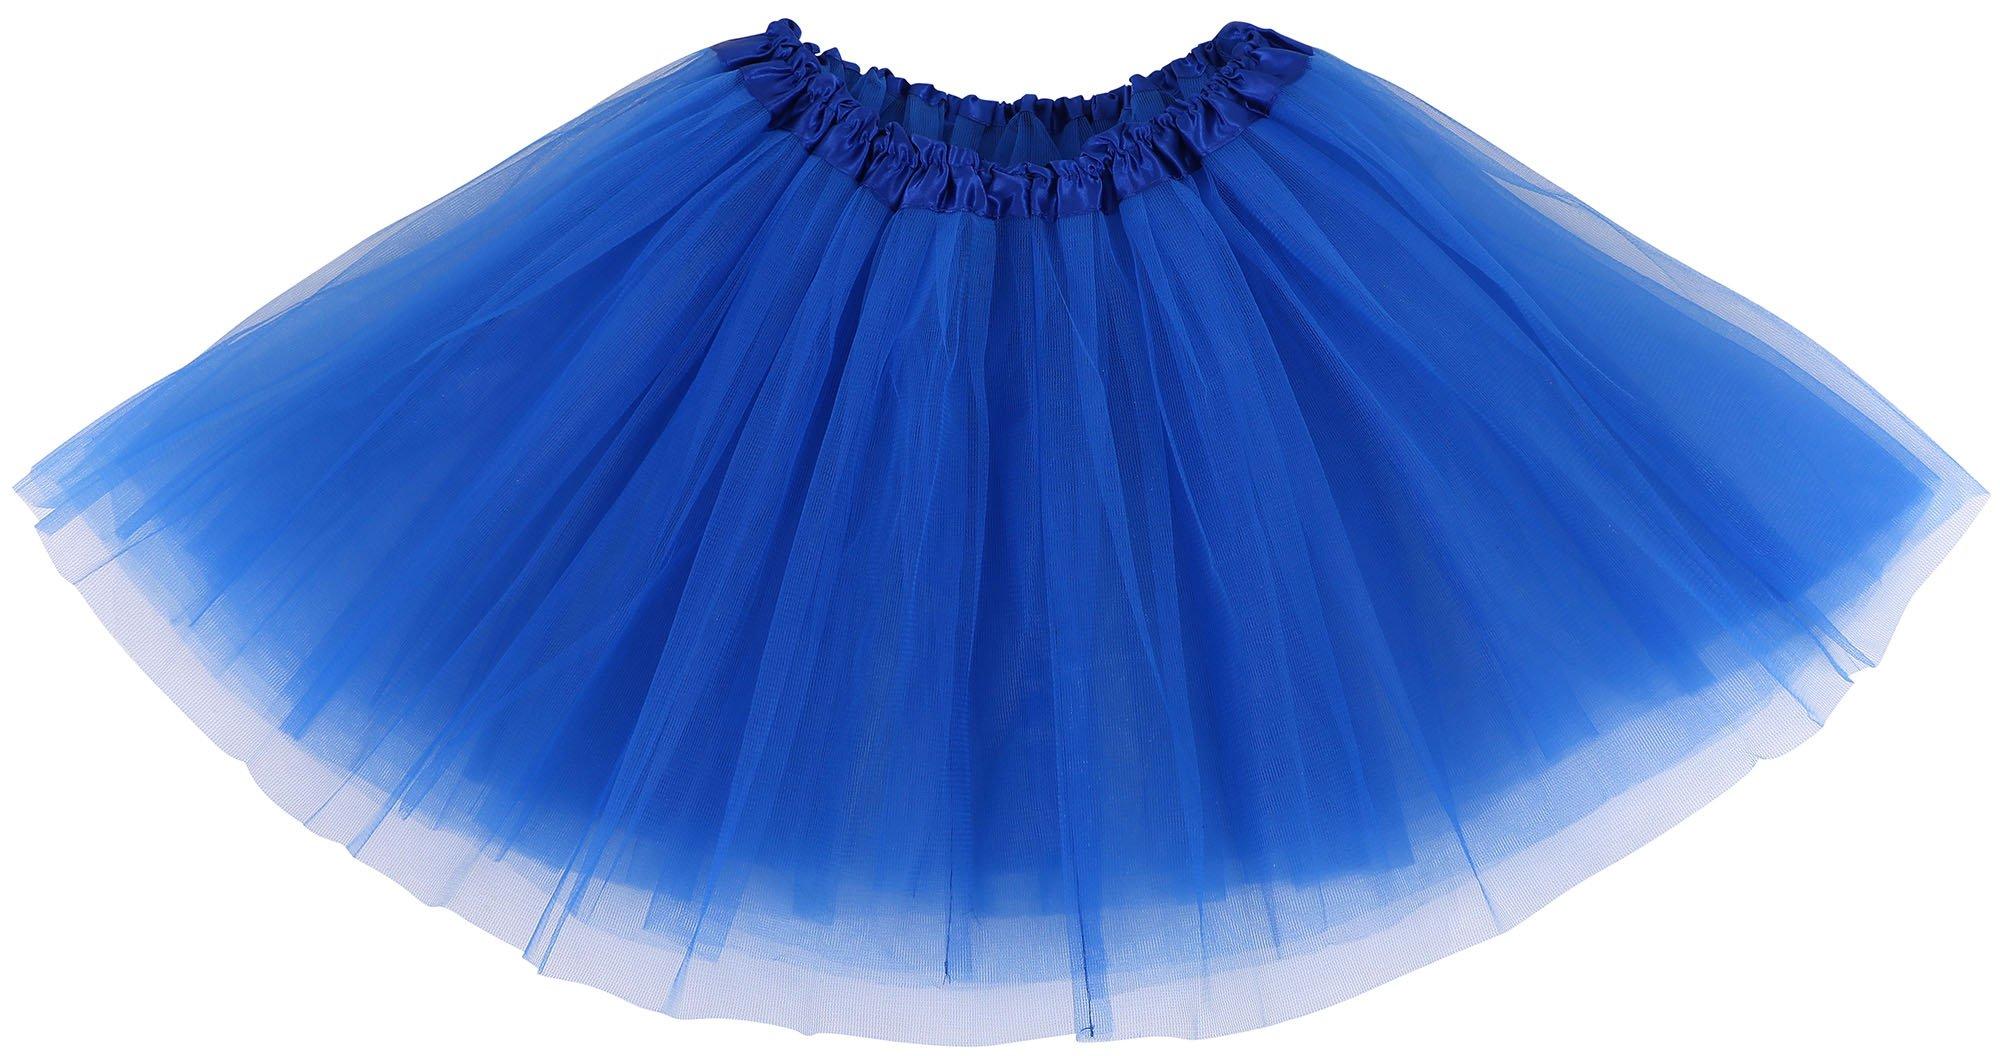 Simplicity Women's Classic Elastic, 3-Layered Tulle Tutu Skirt, Royal Blue